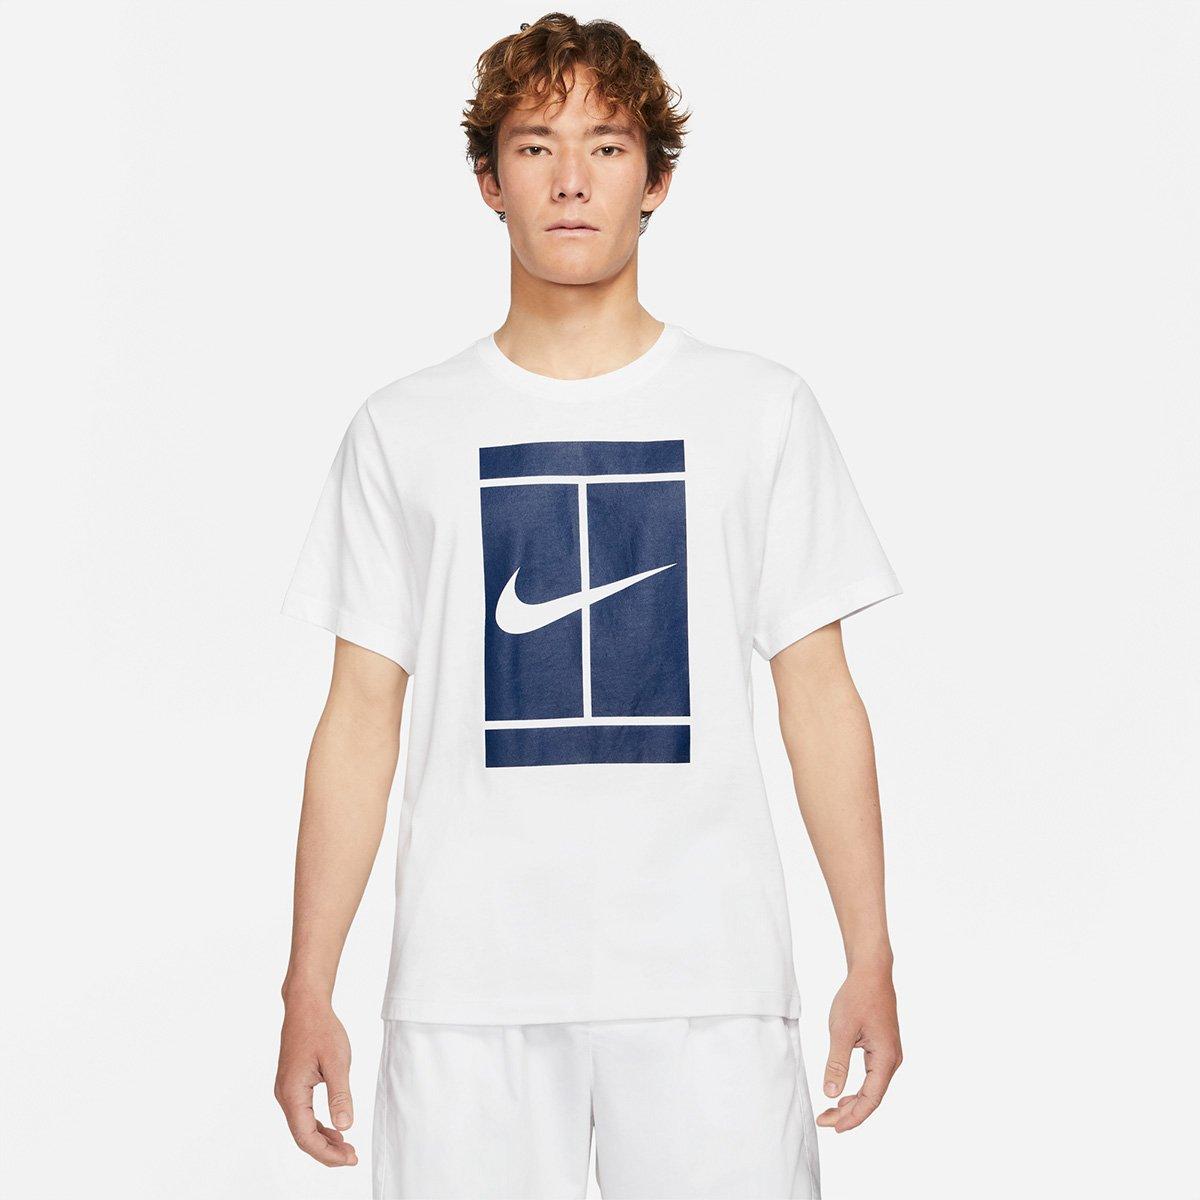 Camiseta Nike Masculina Court Branca